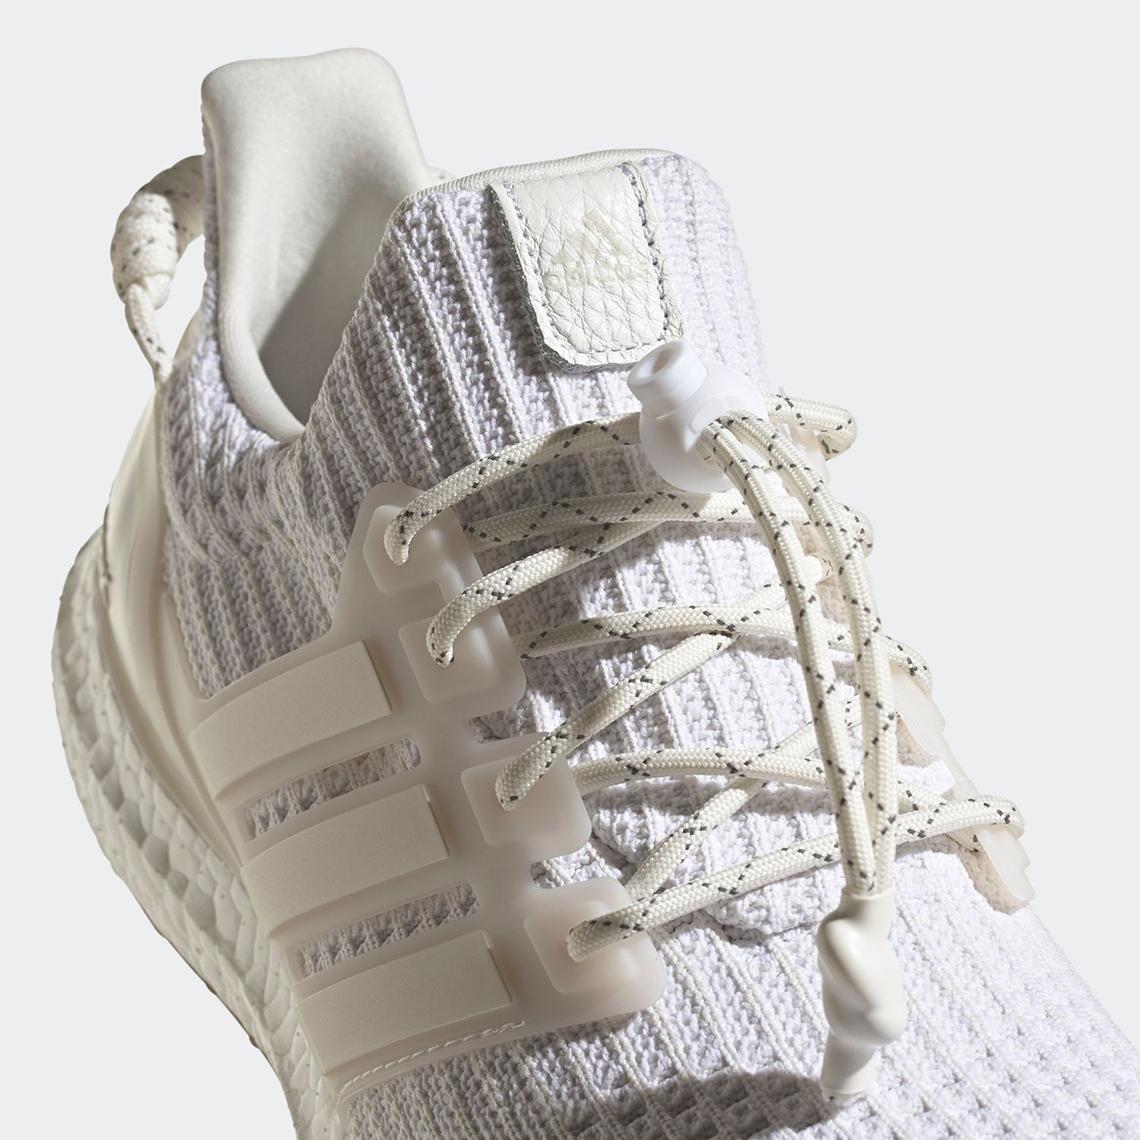 IVY PARK Beyoncé adidas UltraBOOST GX5370 | SneakerNews.com